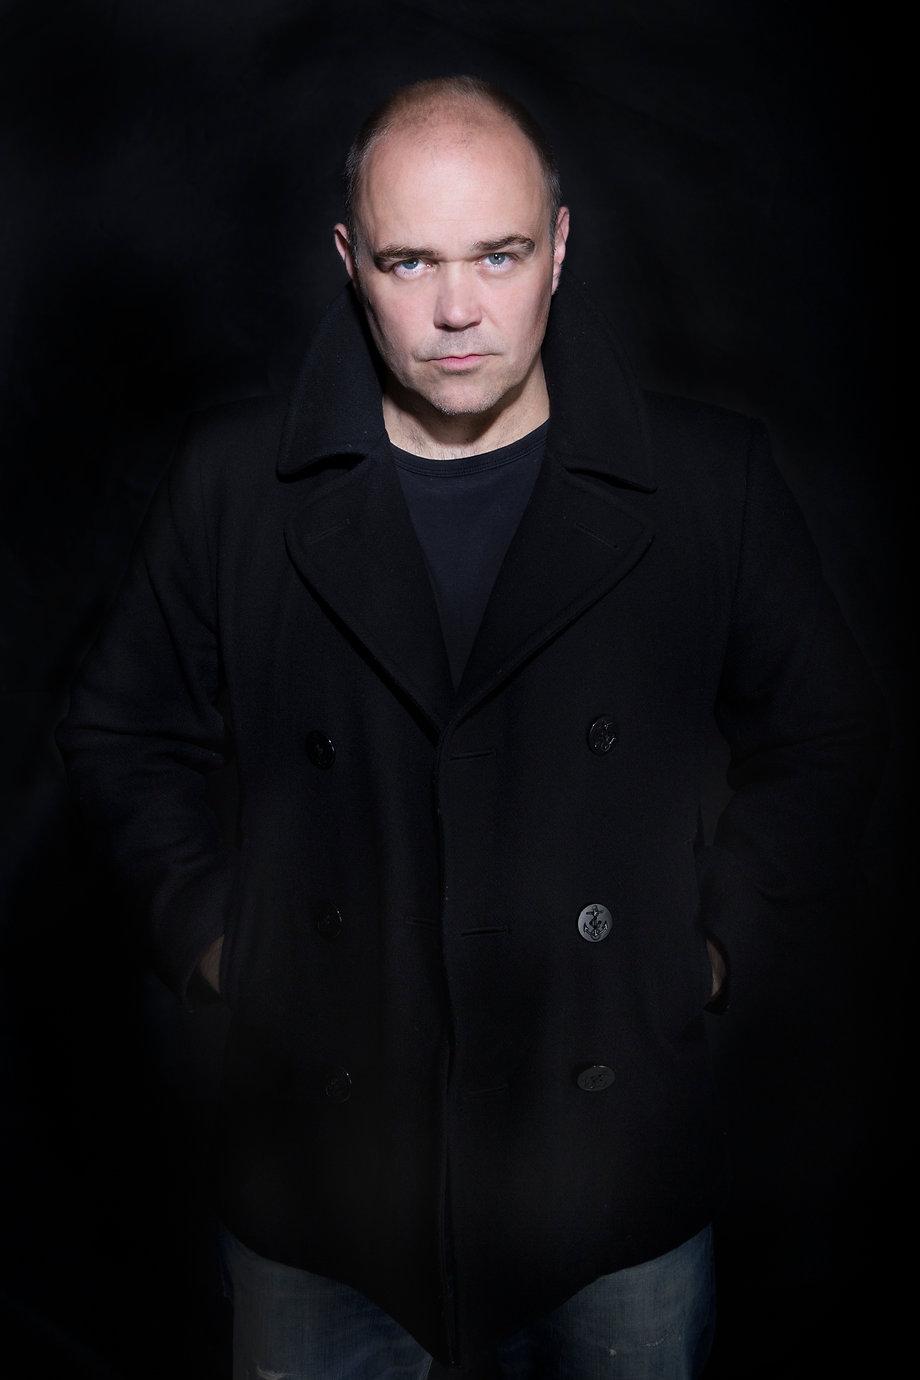 Chris Holland Singer, Les Miserables, Actor, Singing Lessons